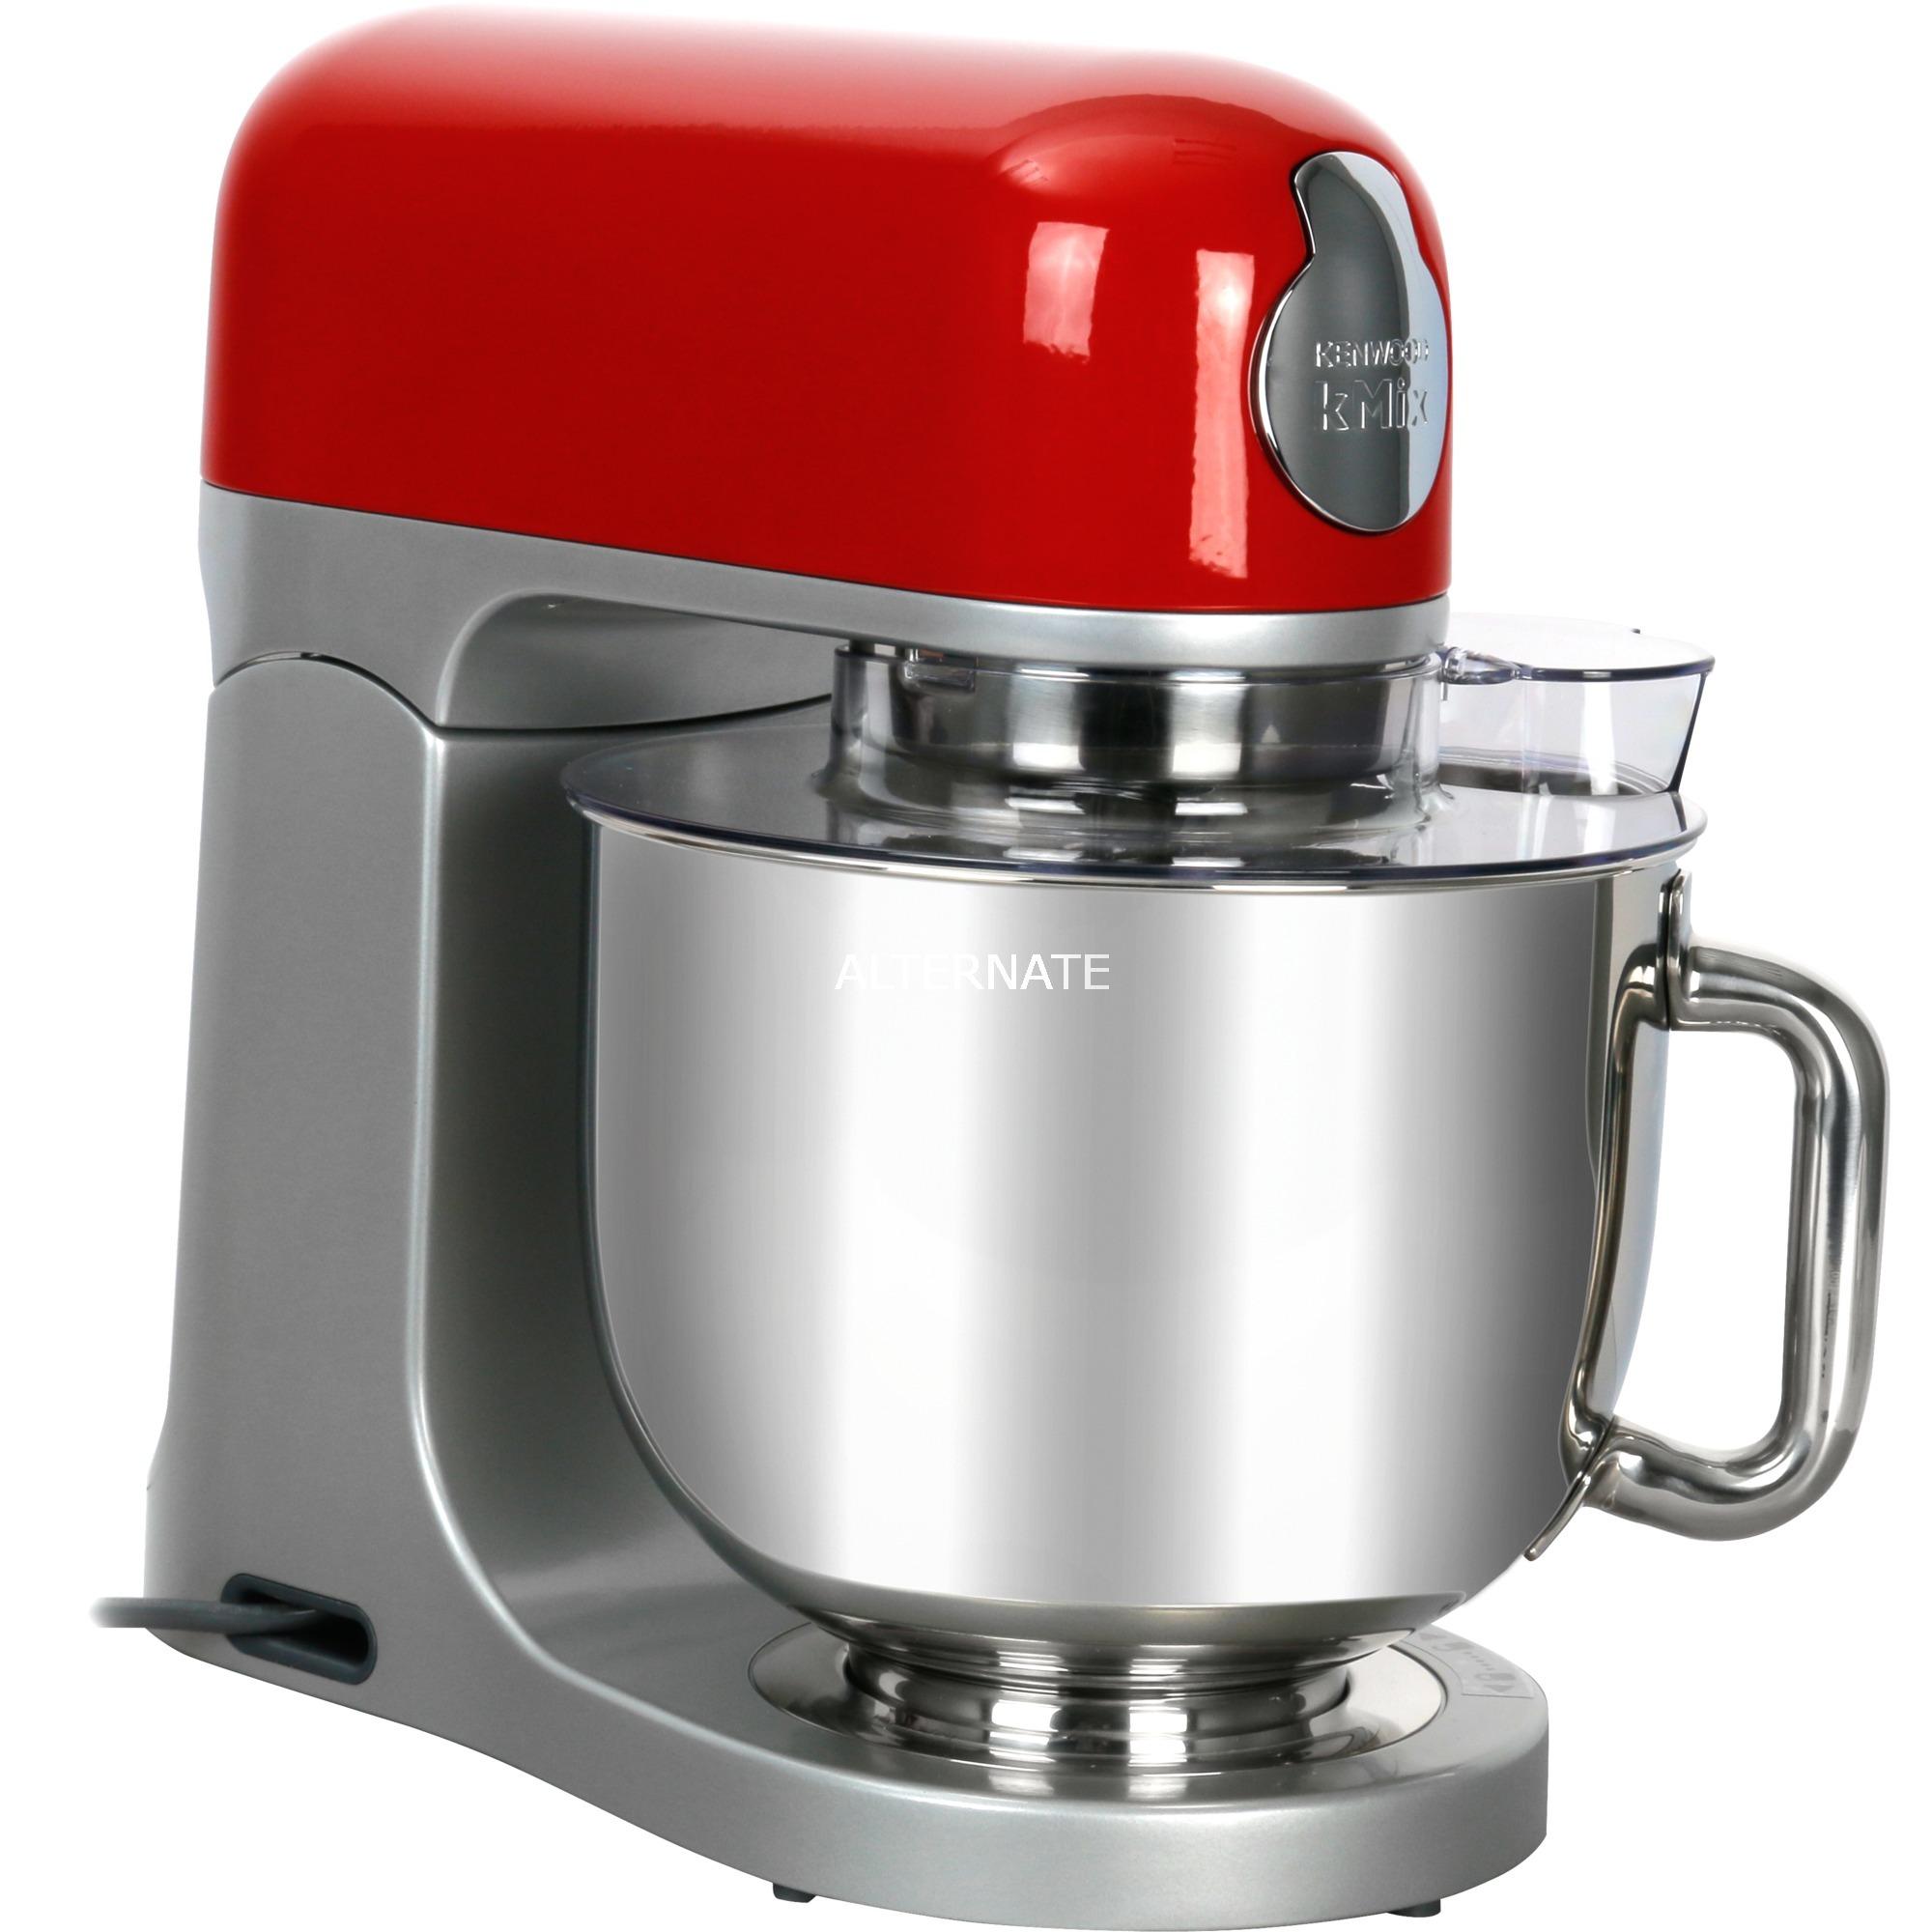 0W20011138 1000W 5L Rojo robot de cocina